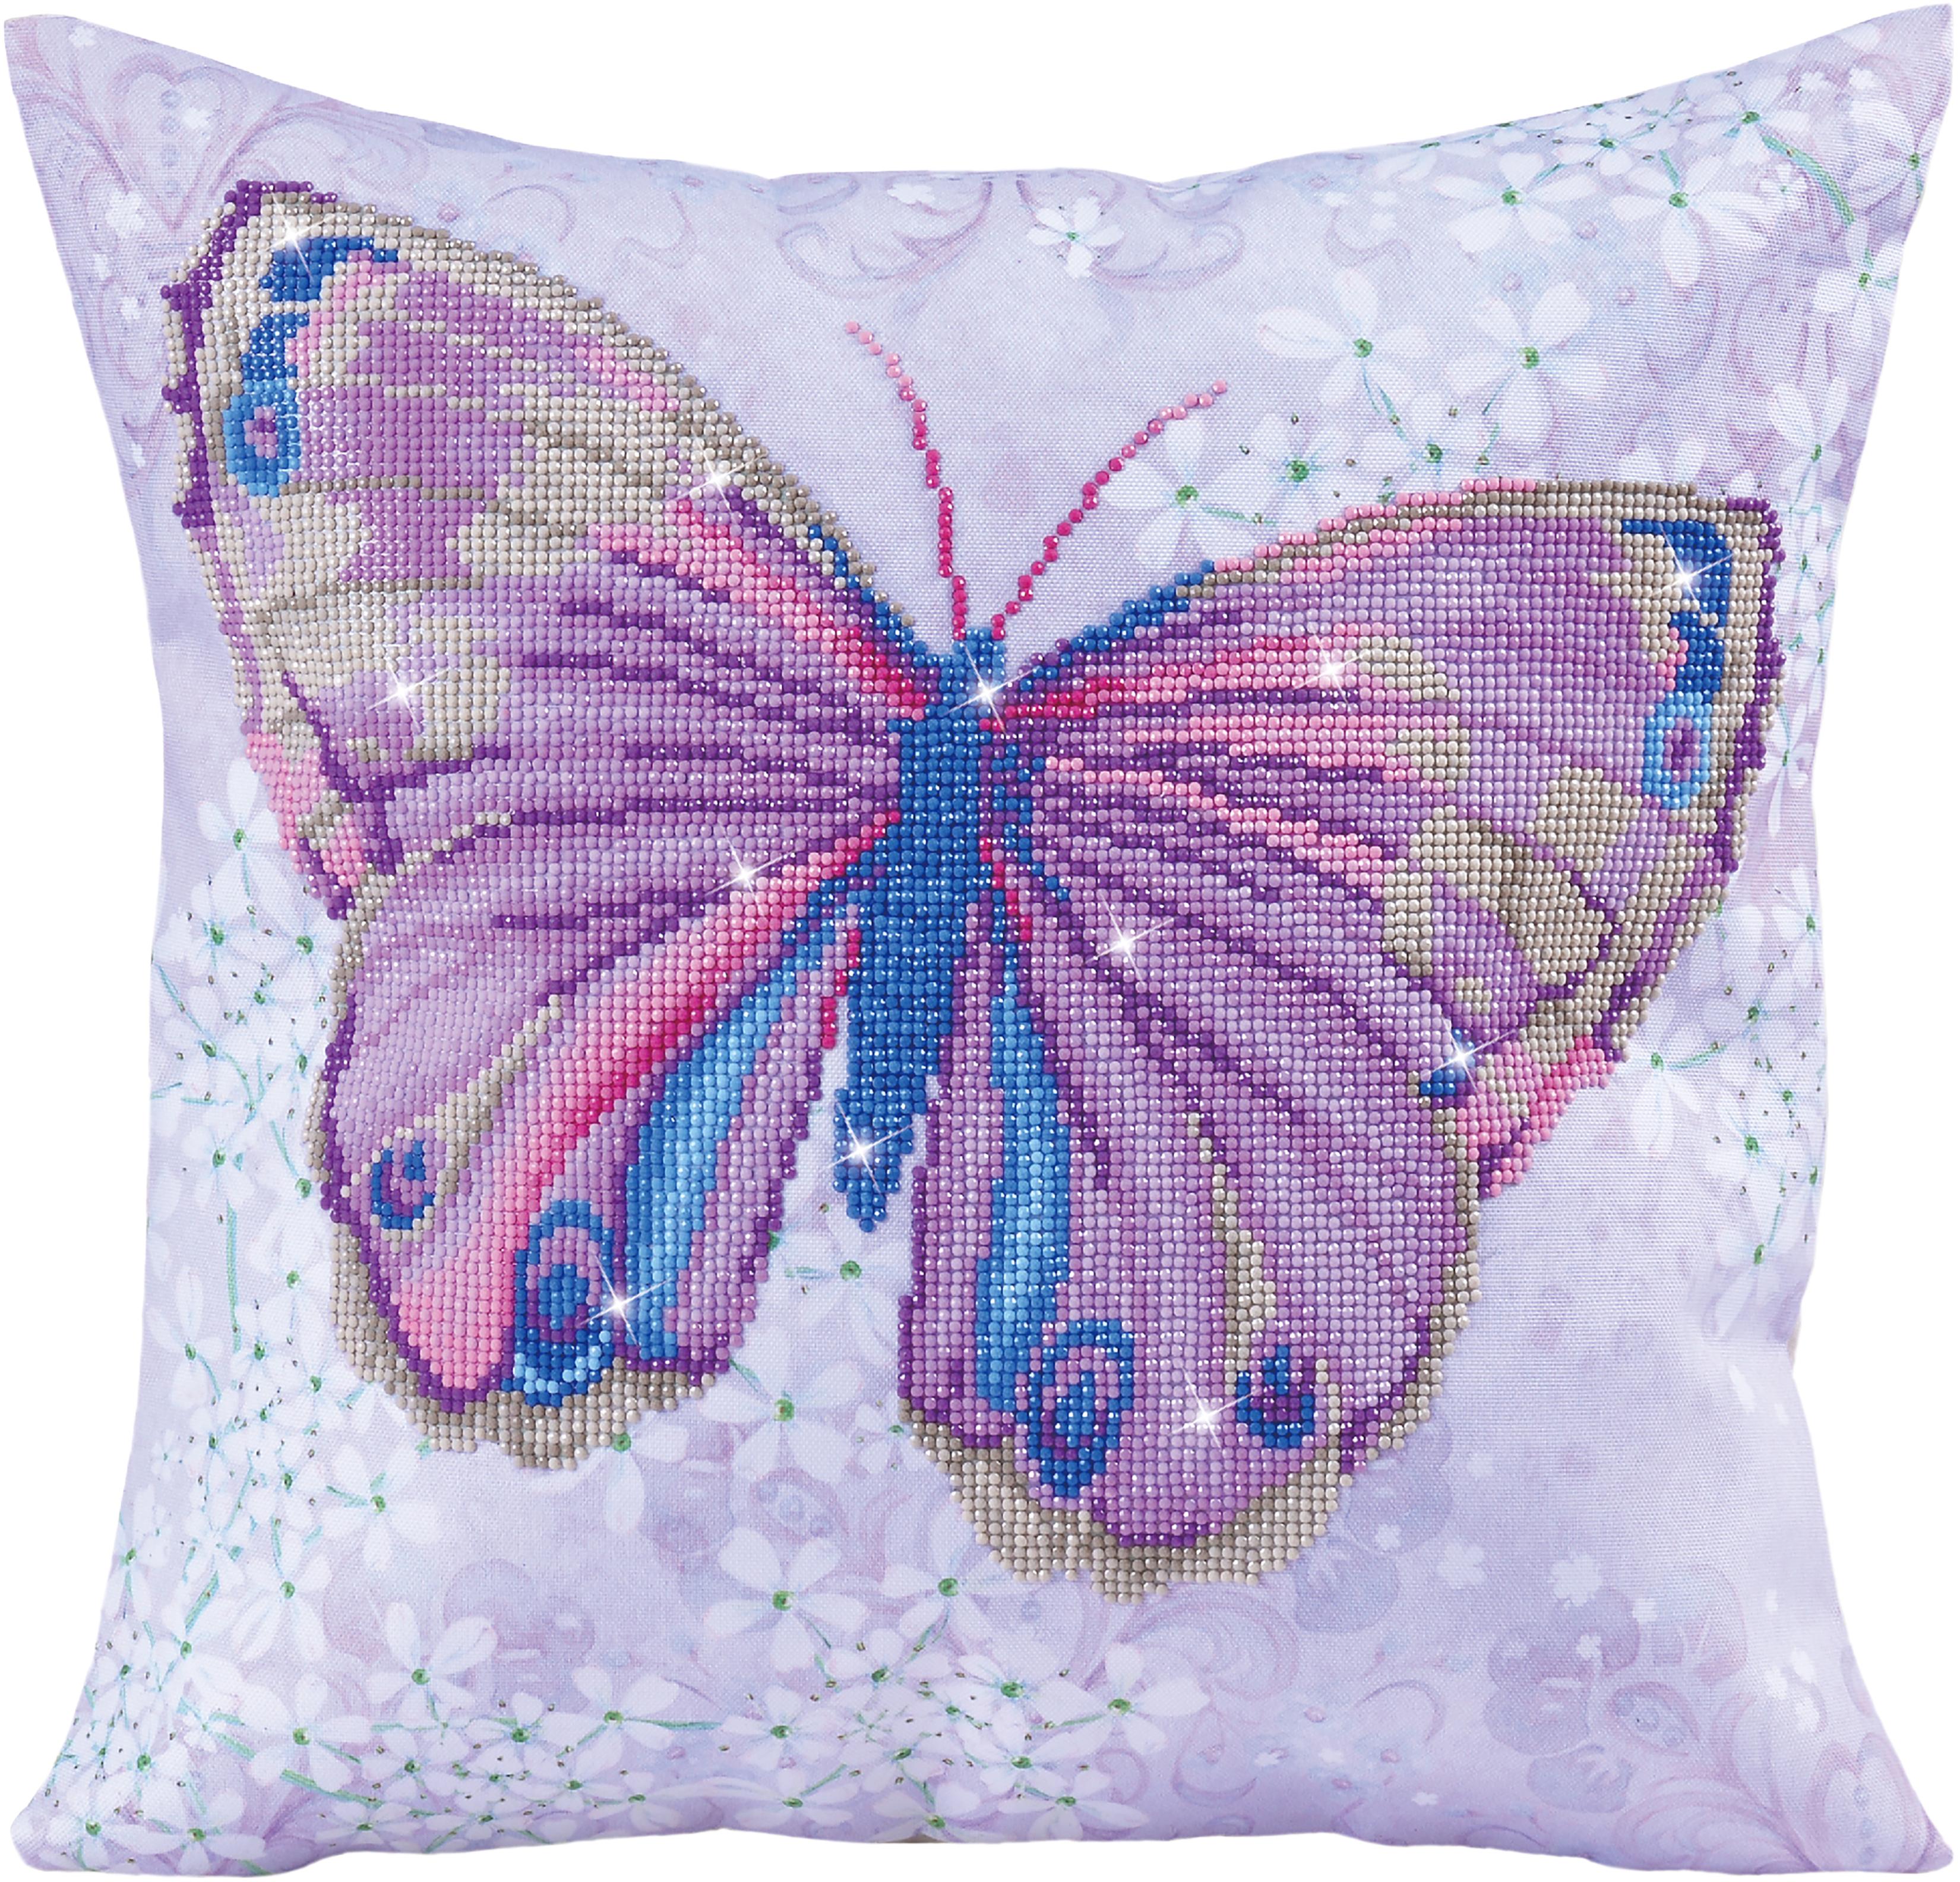 Diamond Dotz Diamond Embroidery Pillow Facet Art Kit-Mauve Flutter 17.5X17.5